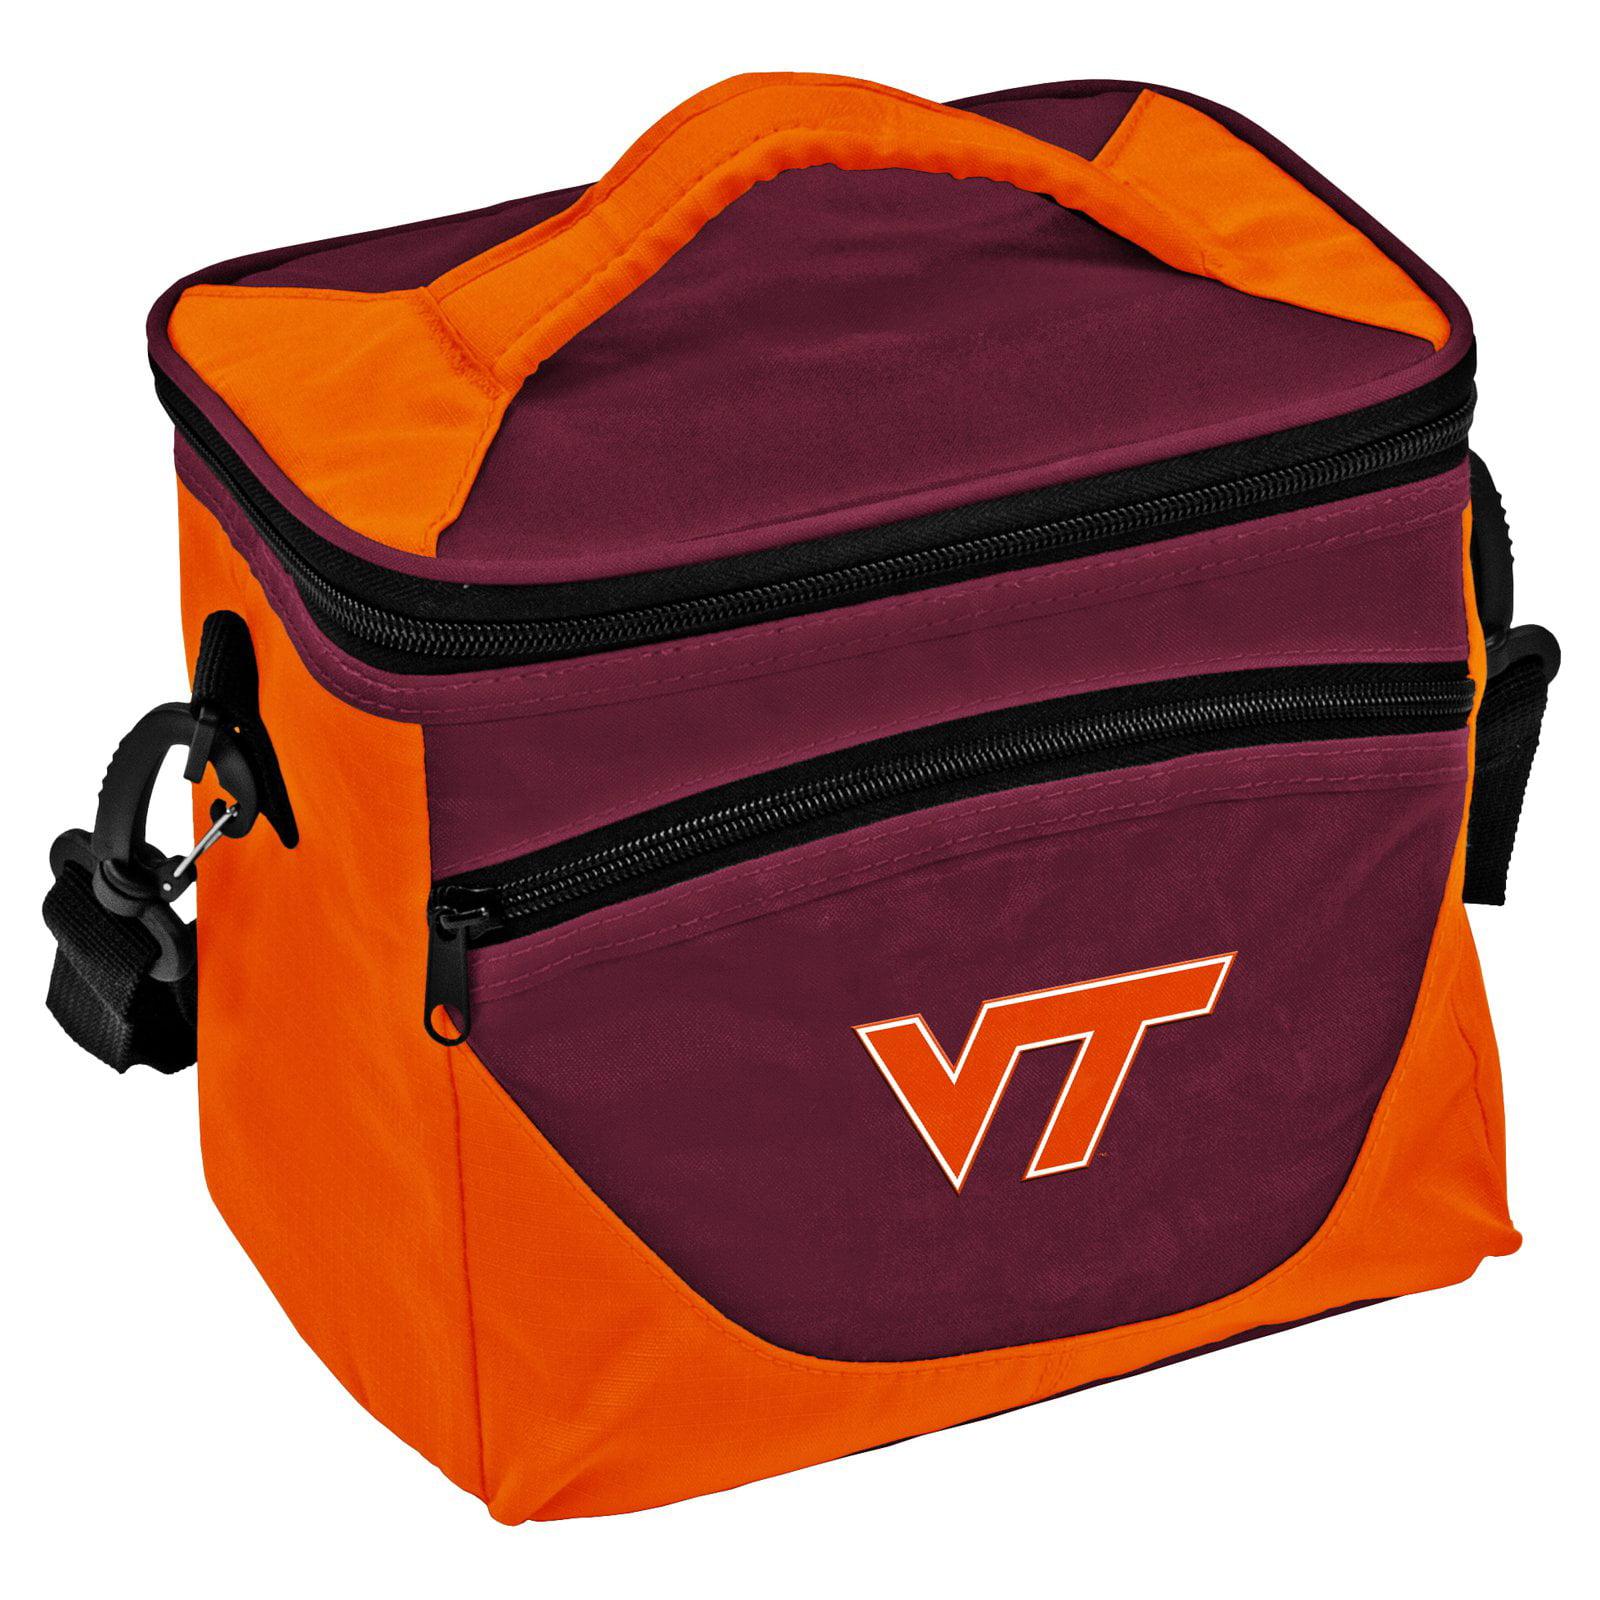 Virginia Tech Hokies Halftime Lunch Cooler